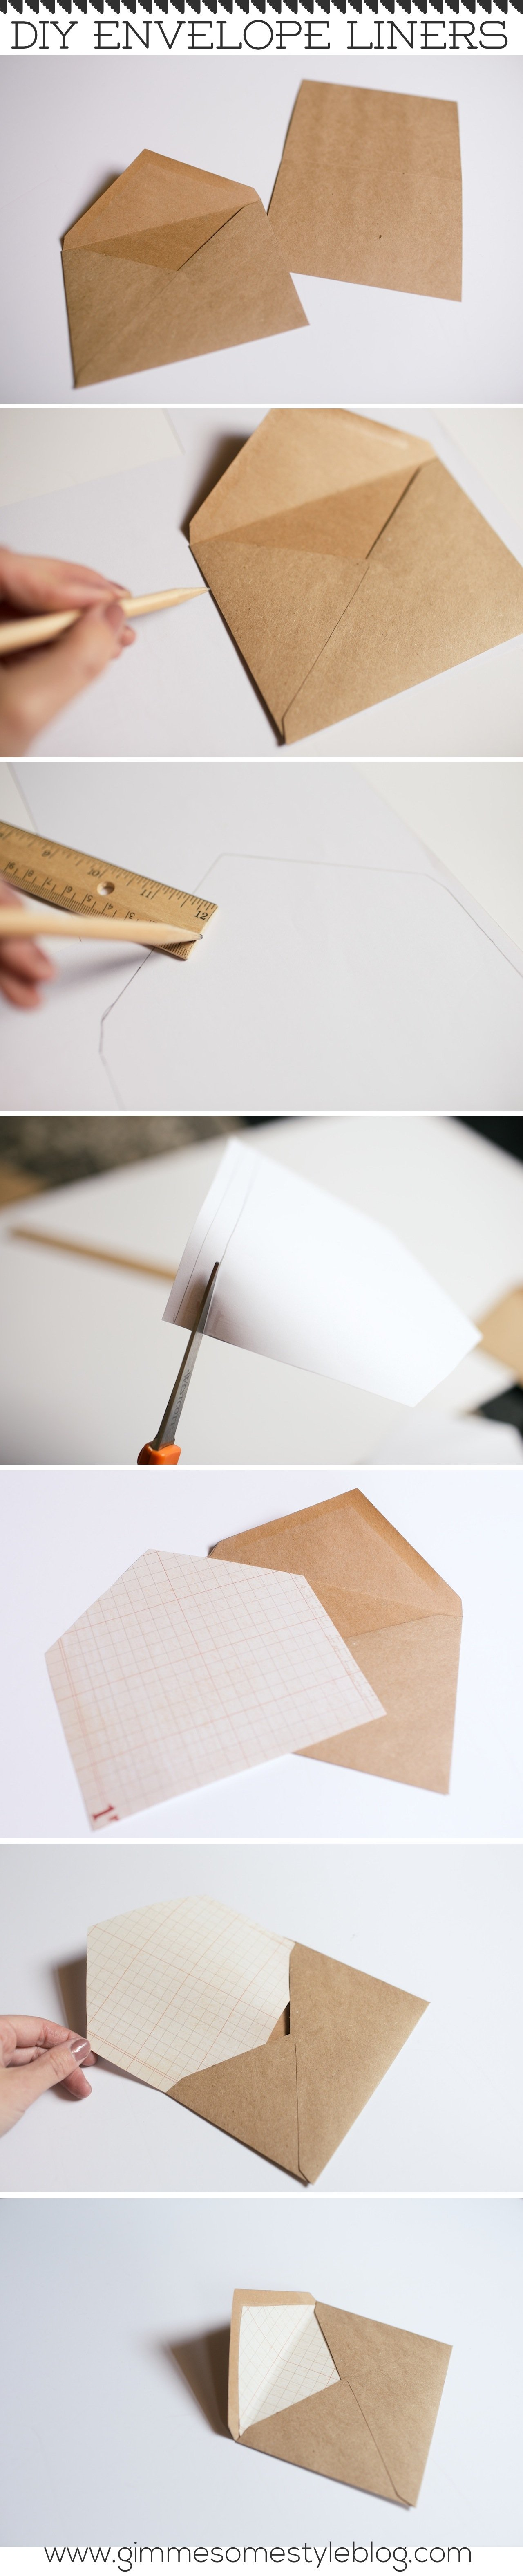 DIY Envelope Liners   www.gimmesomestyleblog.com   #diy